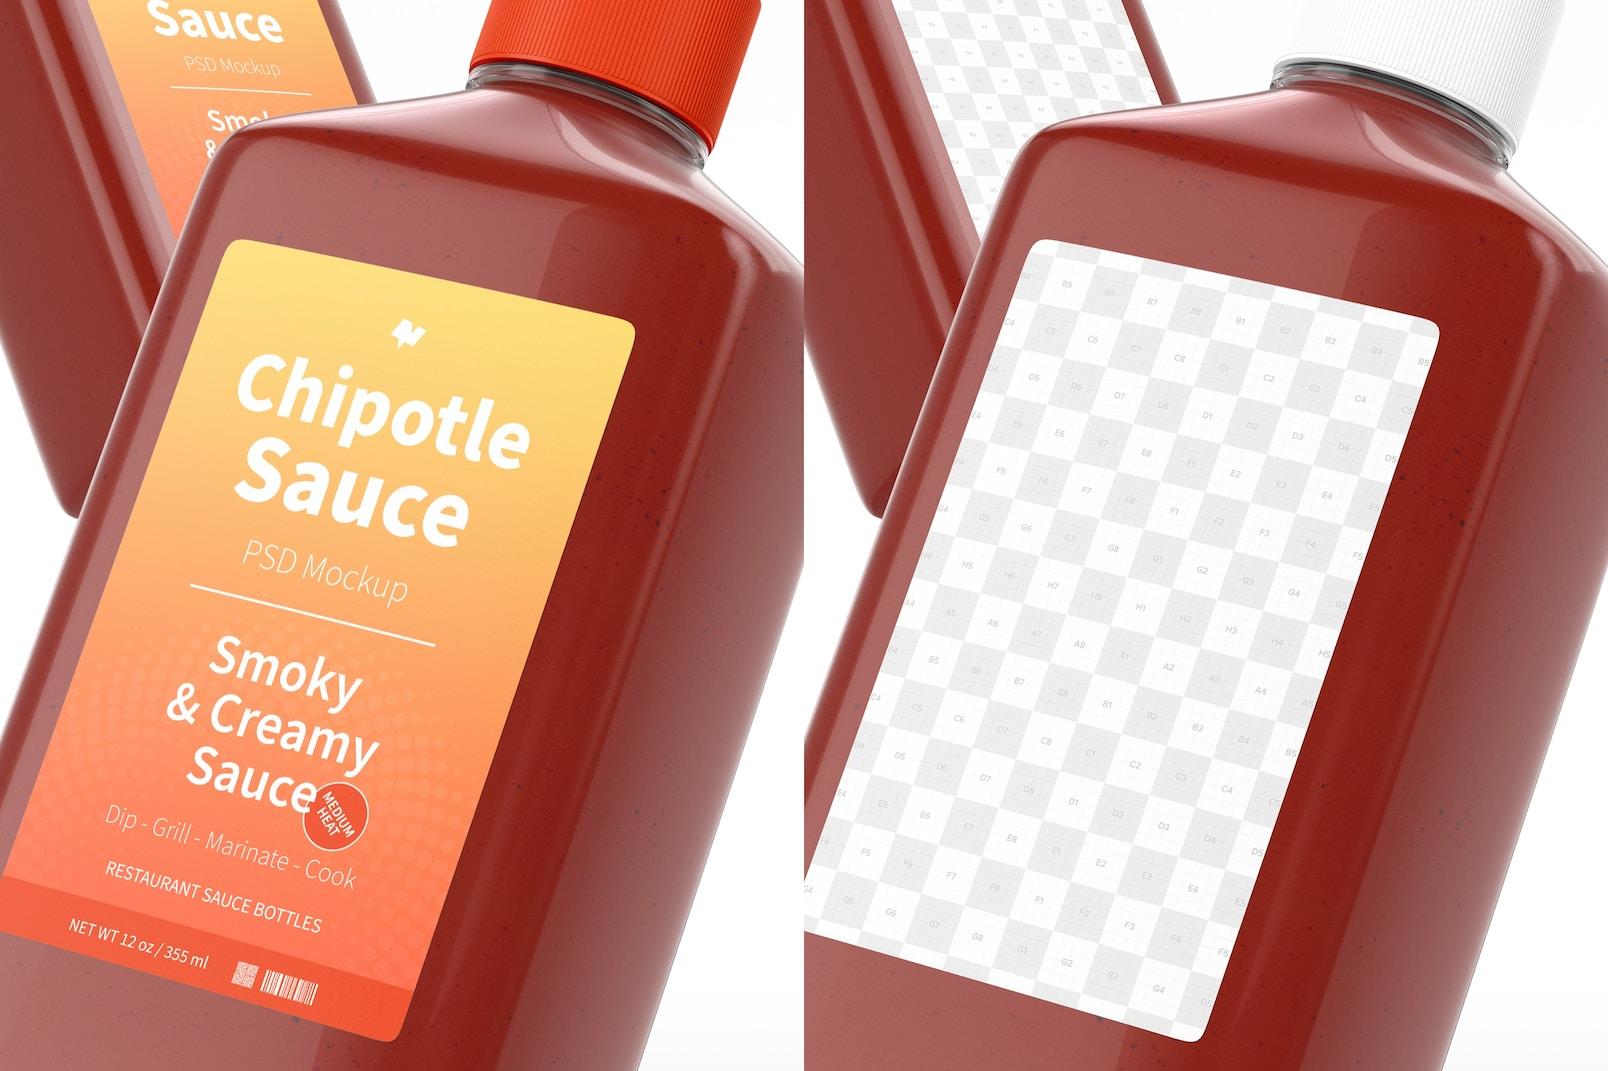 4 oz Chipotle Sauce Bottle Mockup, Close Up